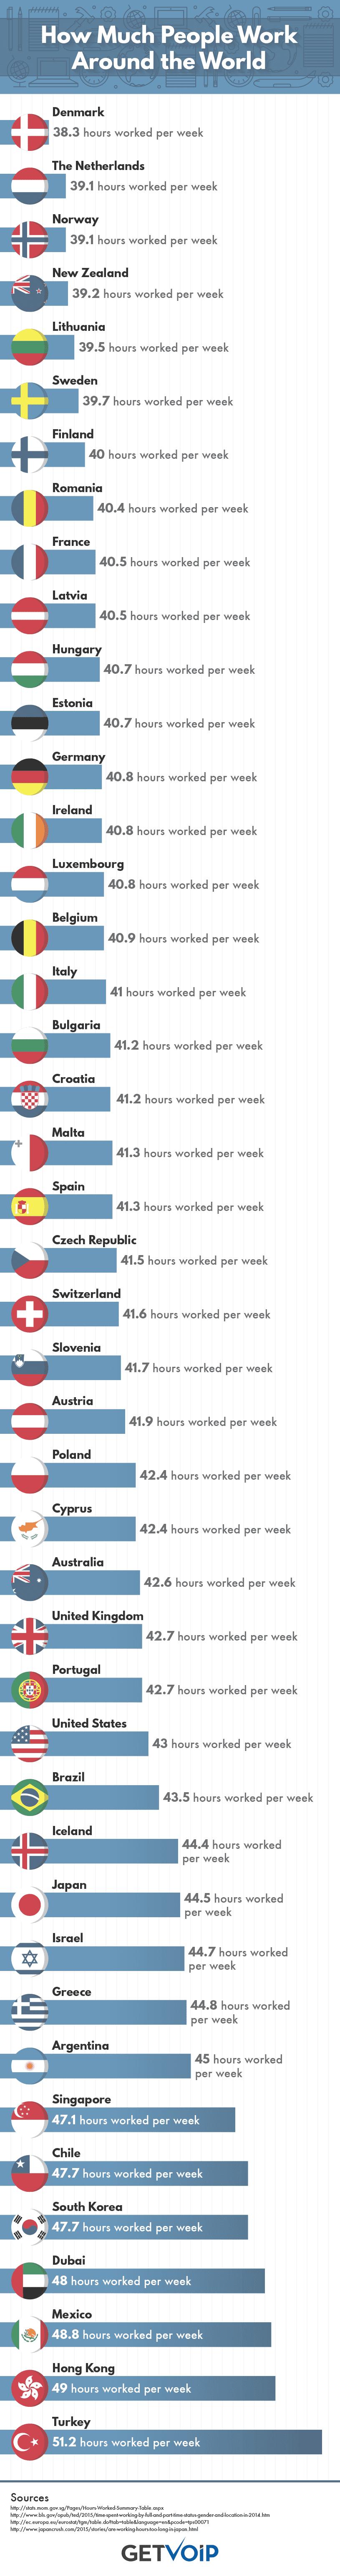 How Much People Work Around the World